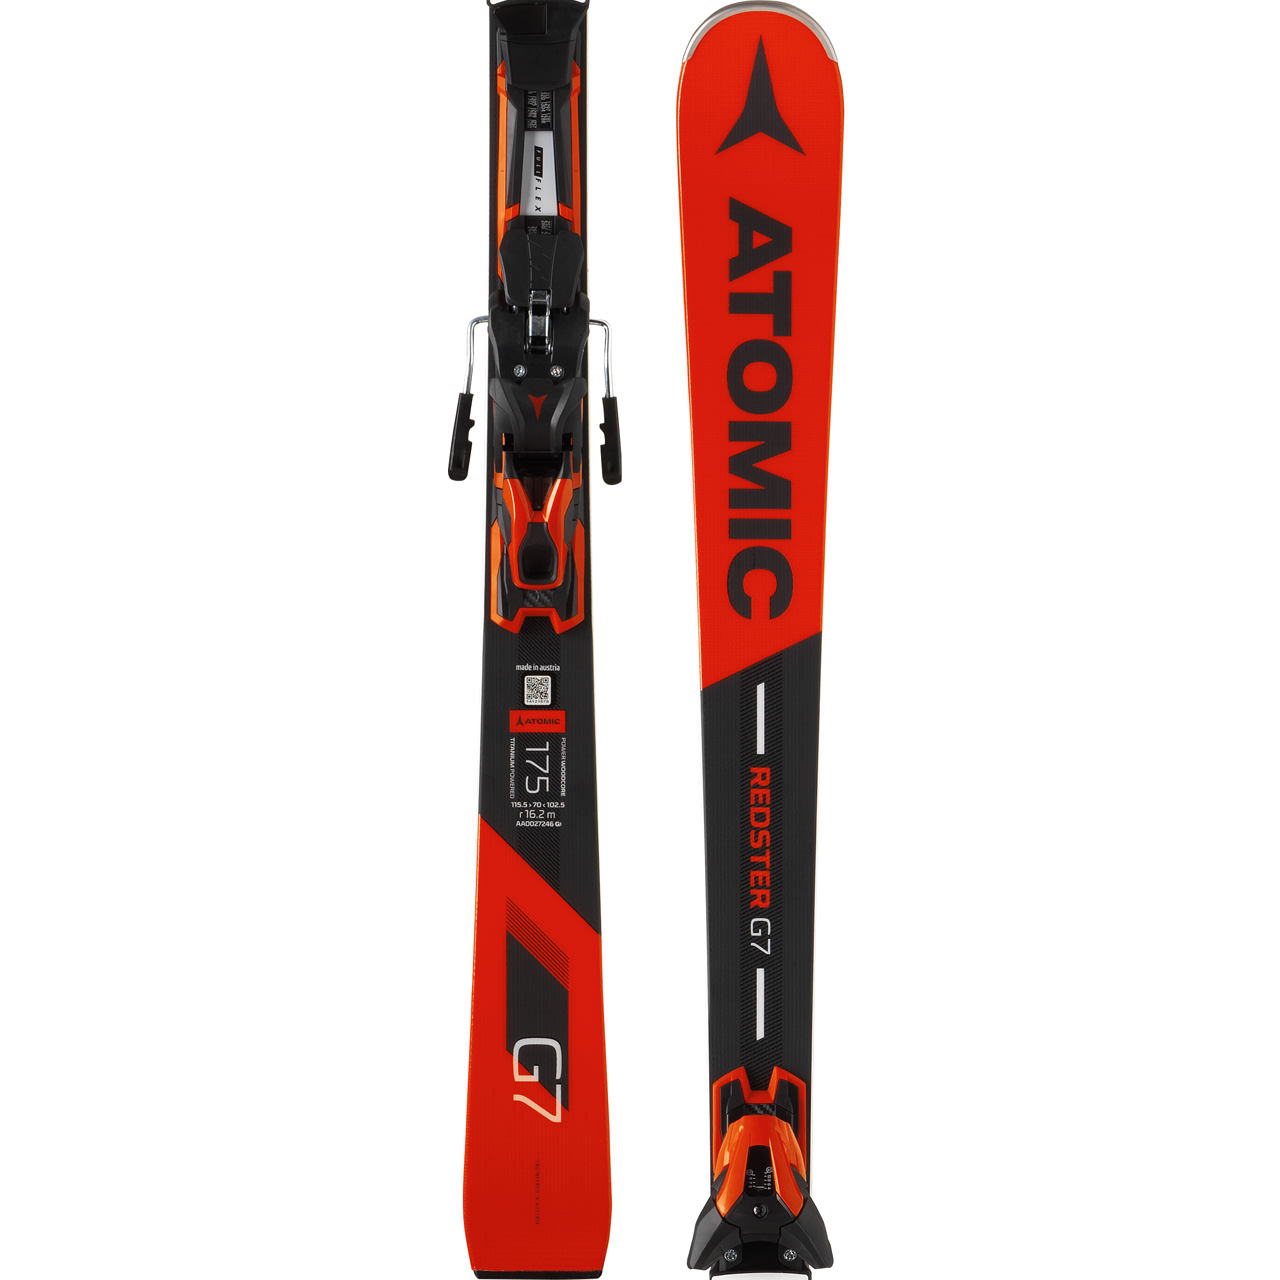 ELX 11 Bindung All Mountain Alpin Herren Set Skisport & Snowboarding Elan Amphibio 14 TI Fusion Ski Alpin